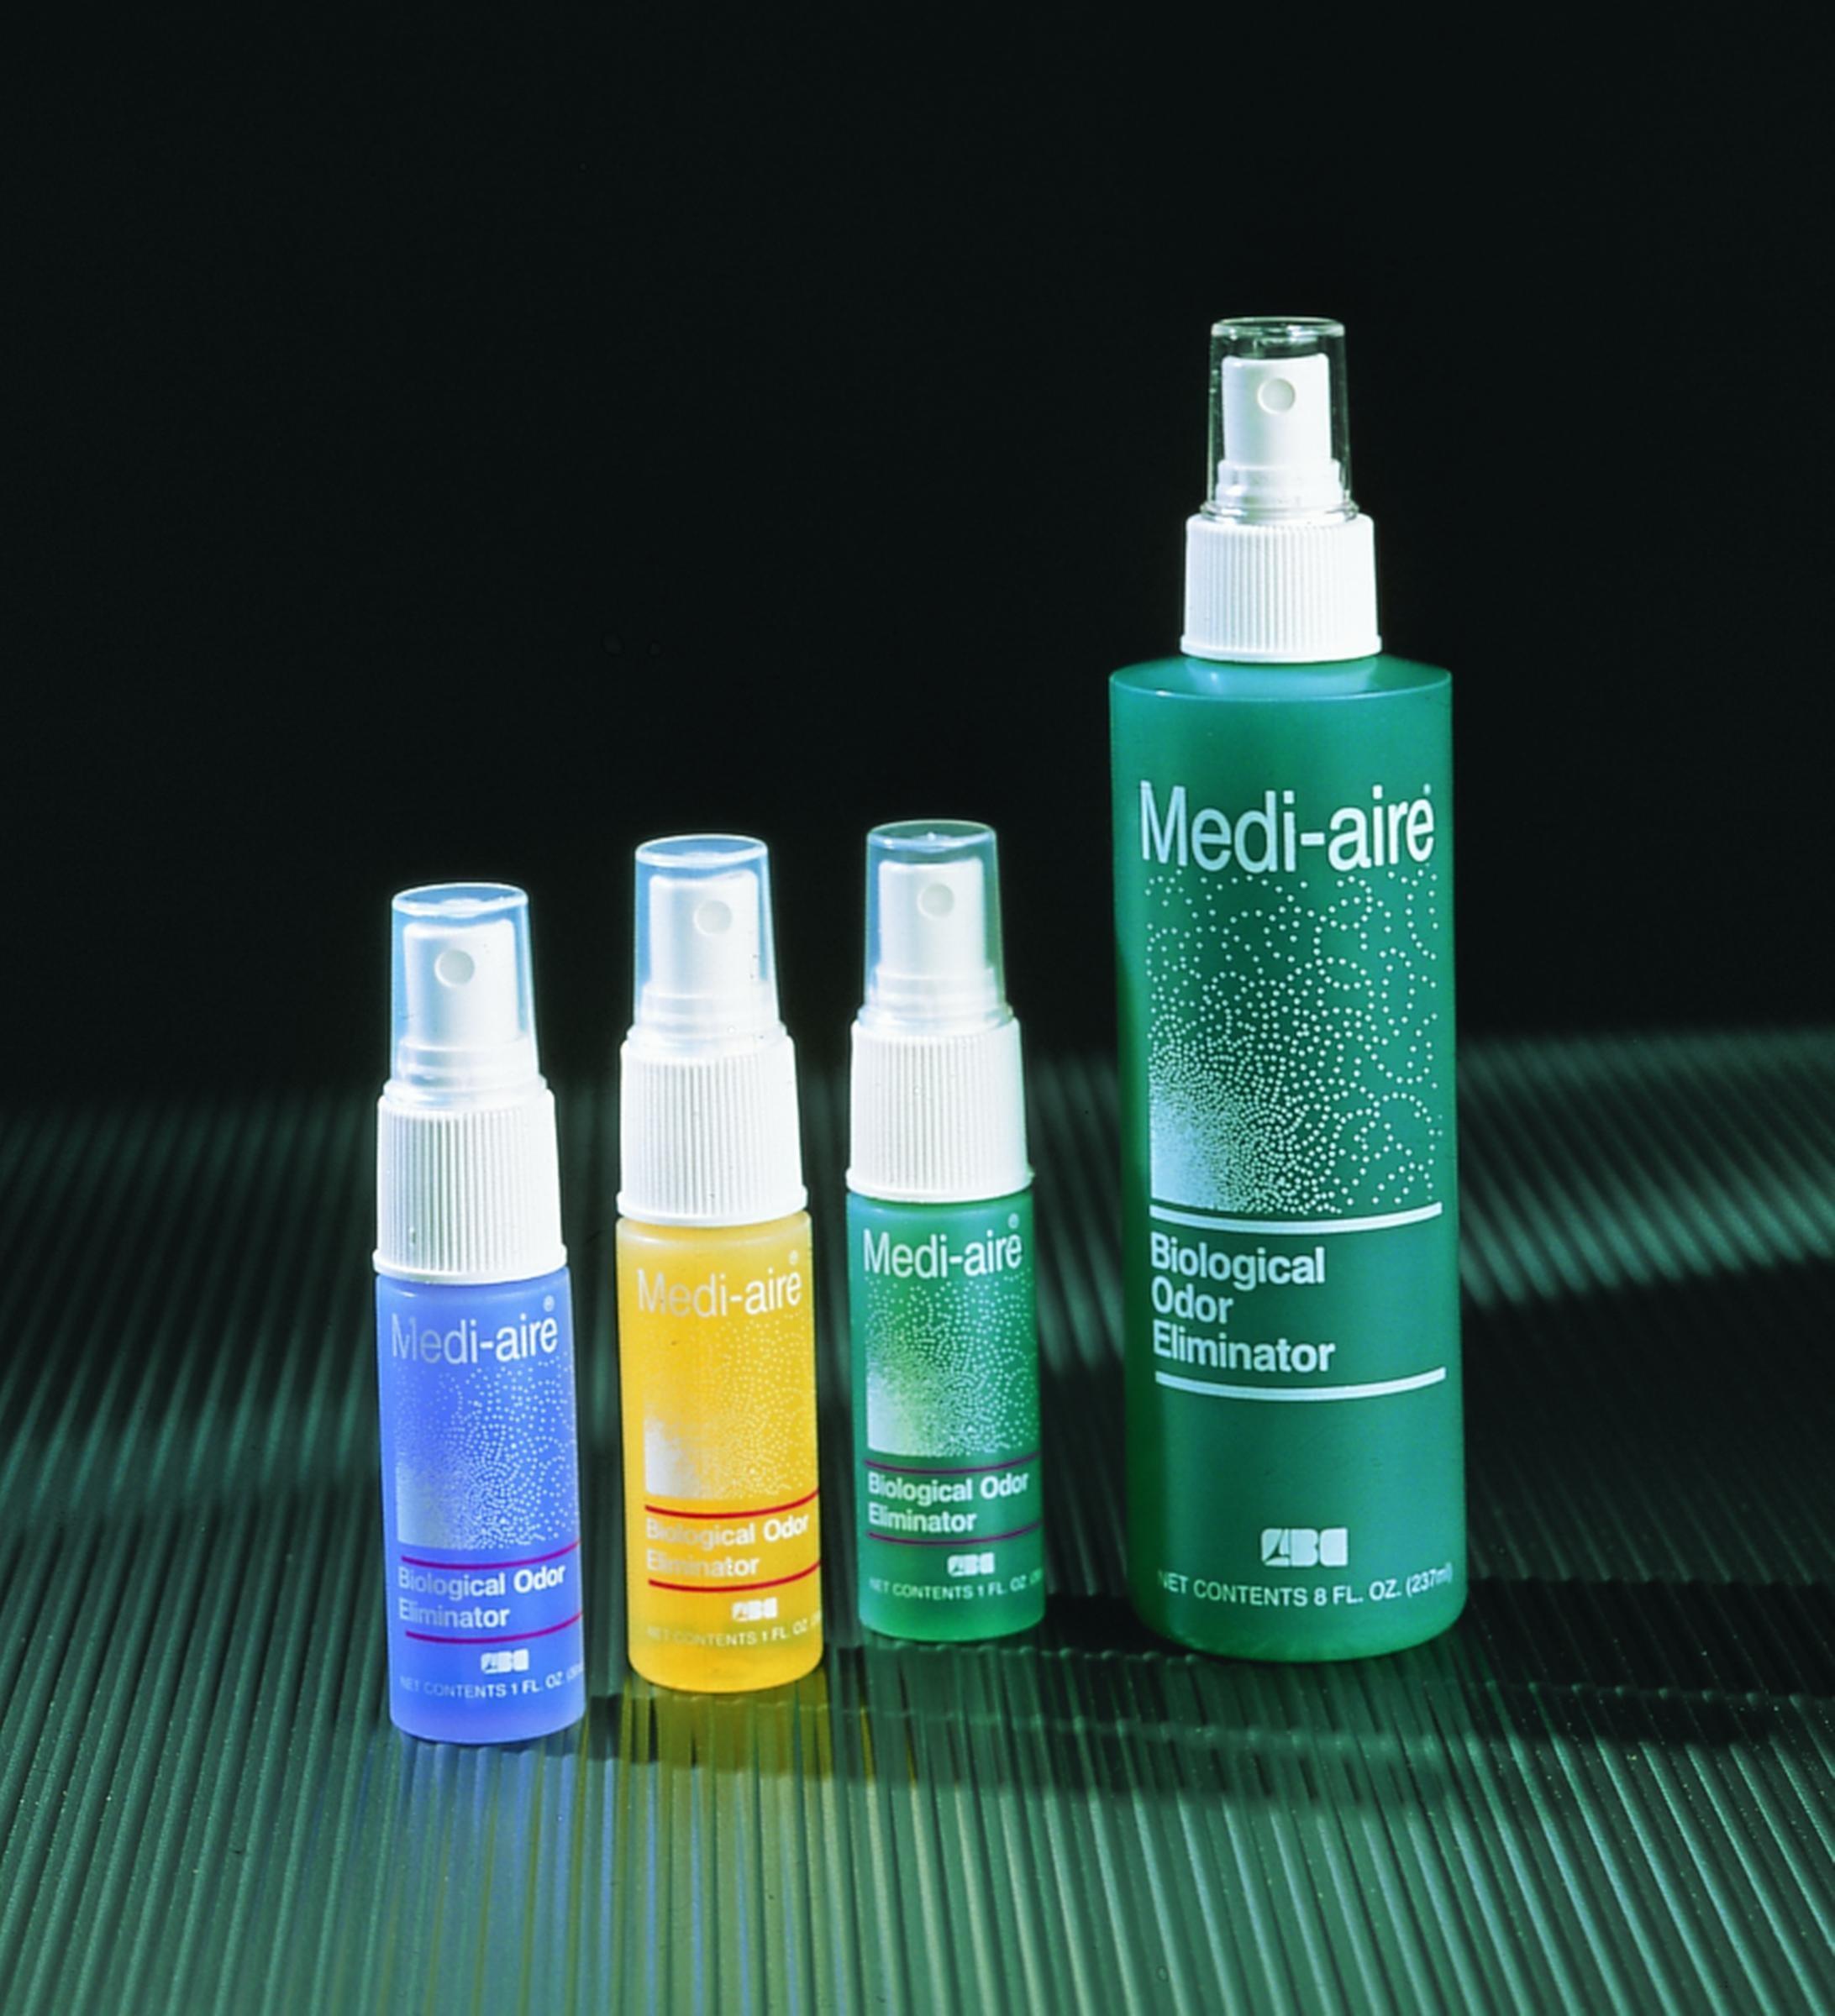 Medi-aireBiological Odor Eliminator 1 fl oz Spray Bottle/Fresh Air Scent